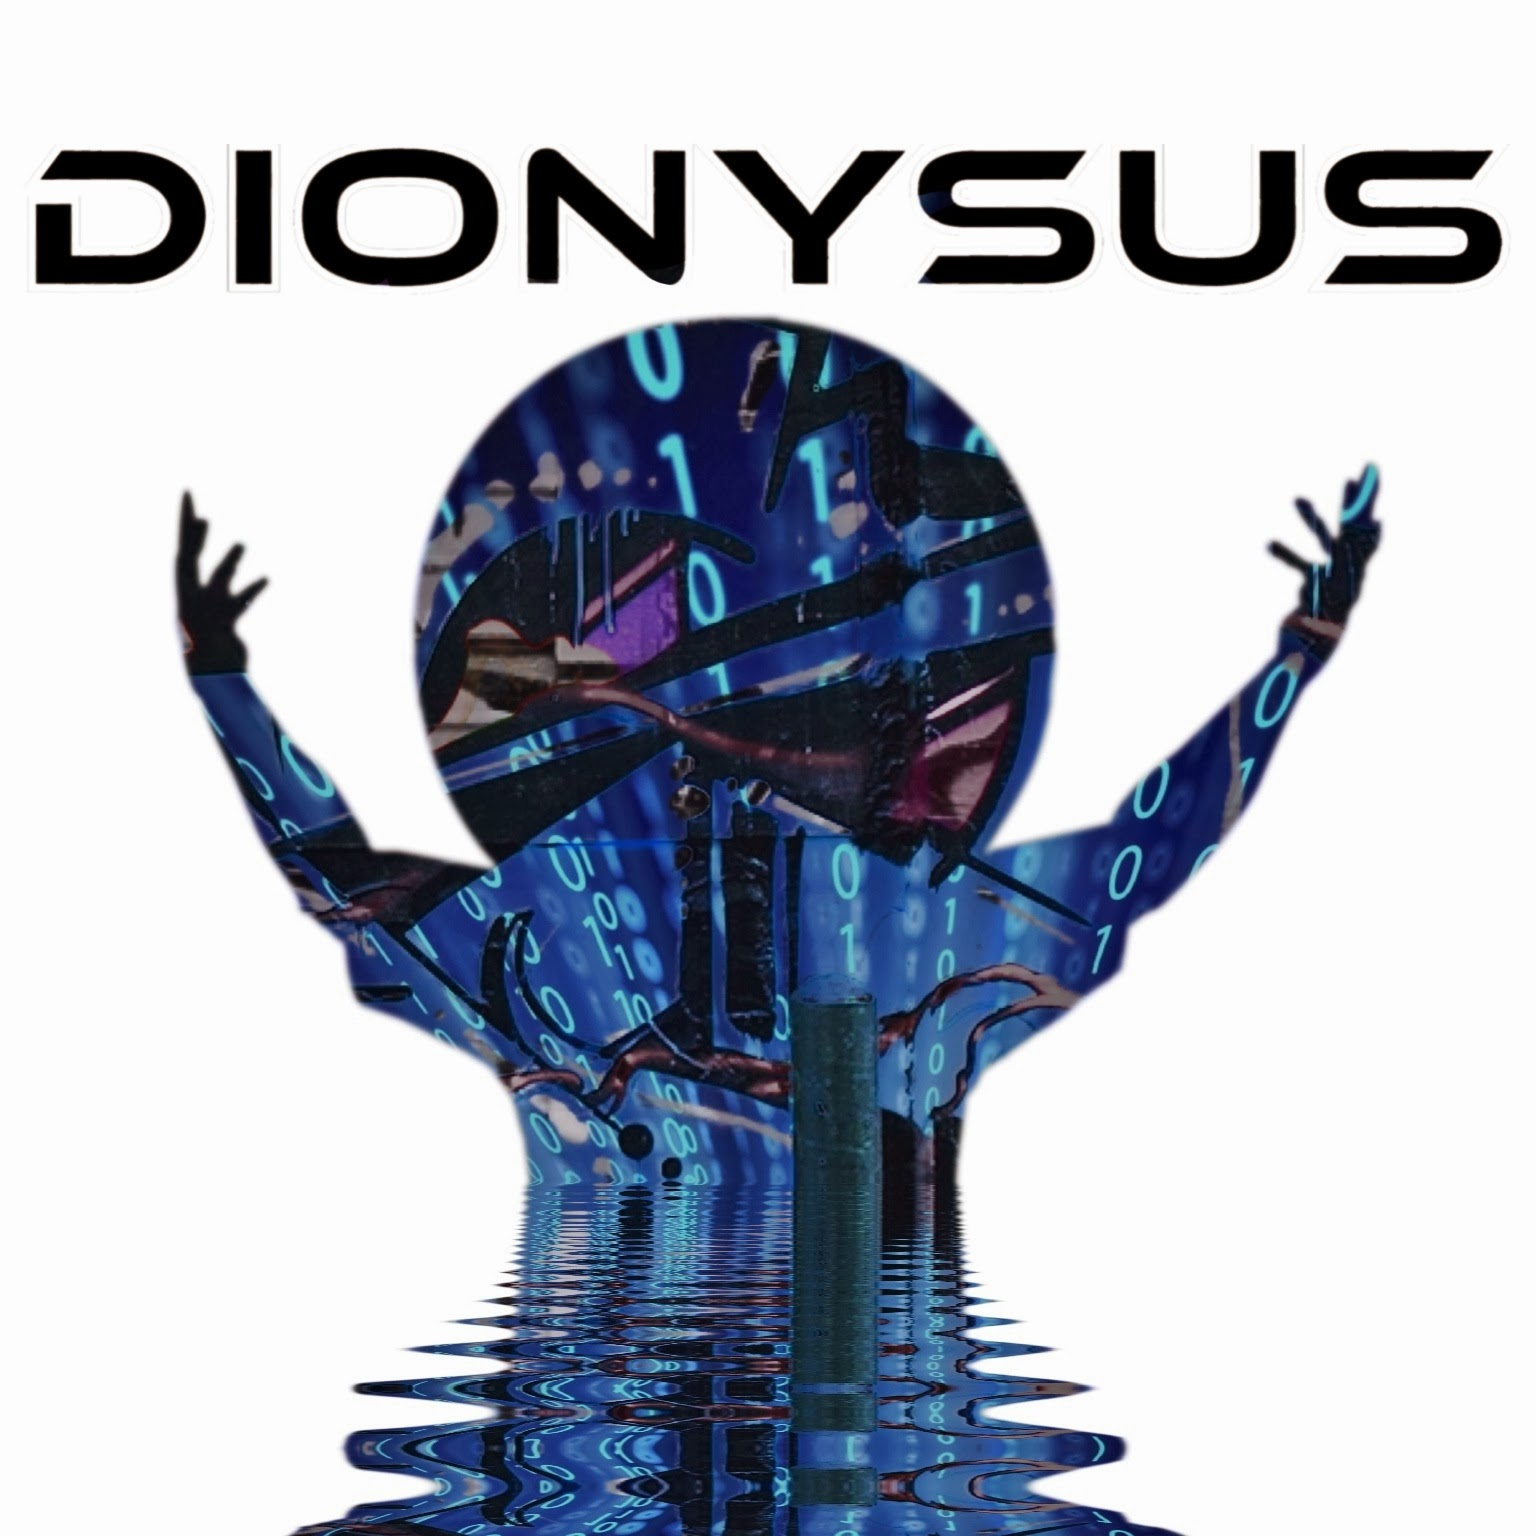 Dionysus VS Martin Garrix - Electric Heart Beats edm, electronic